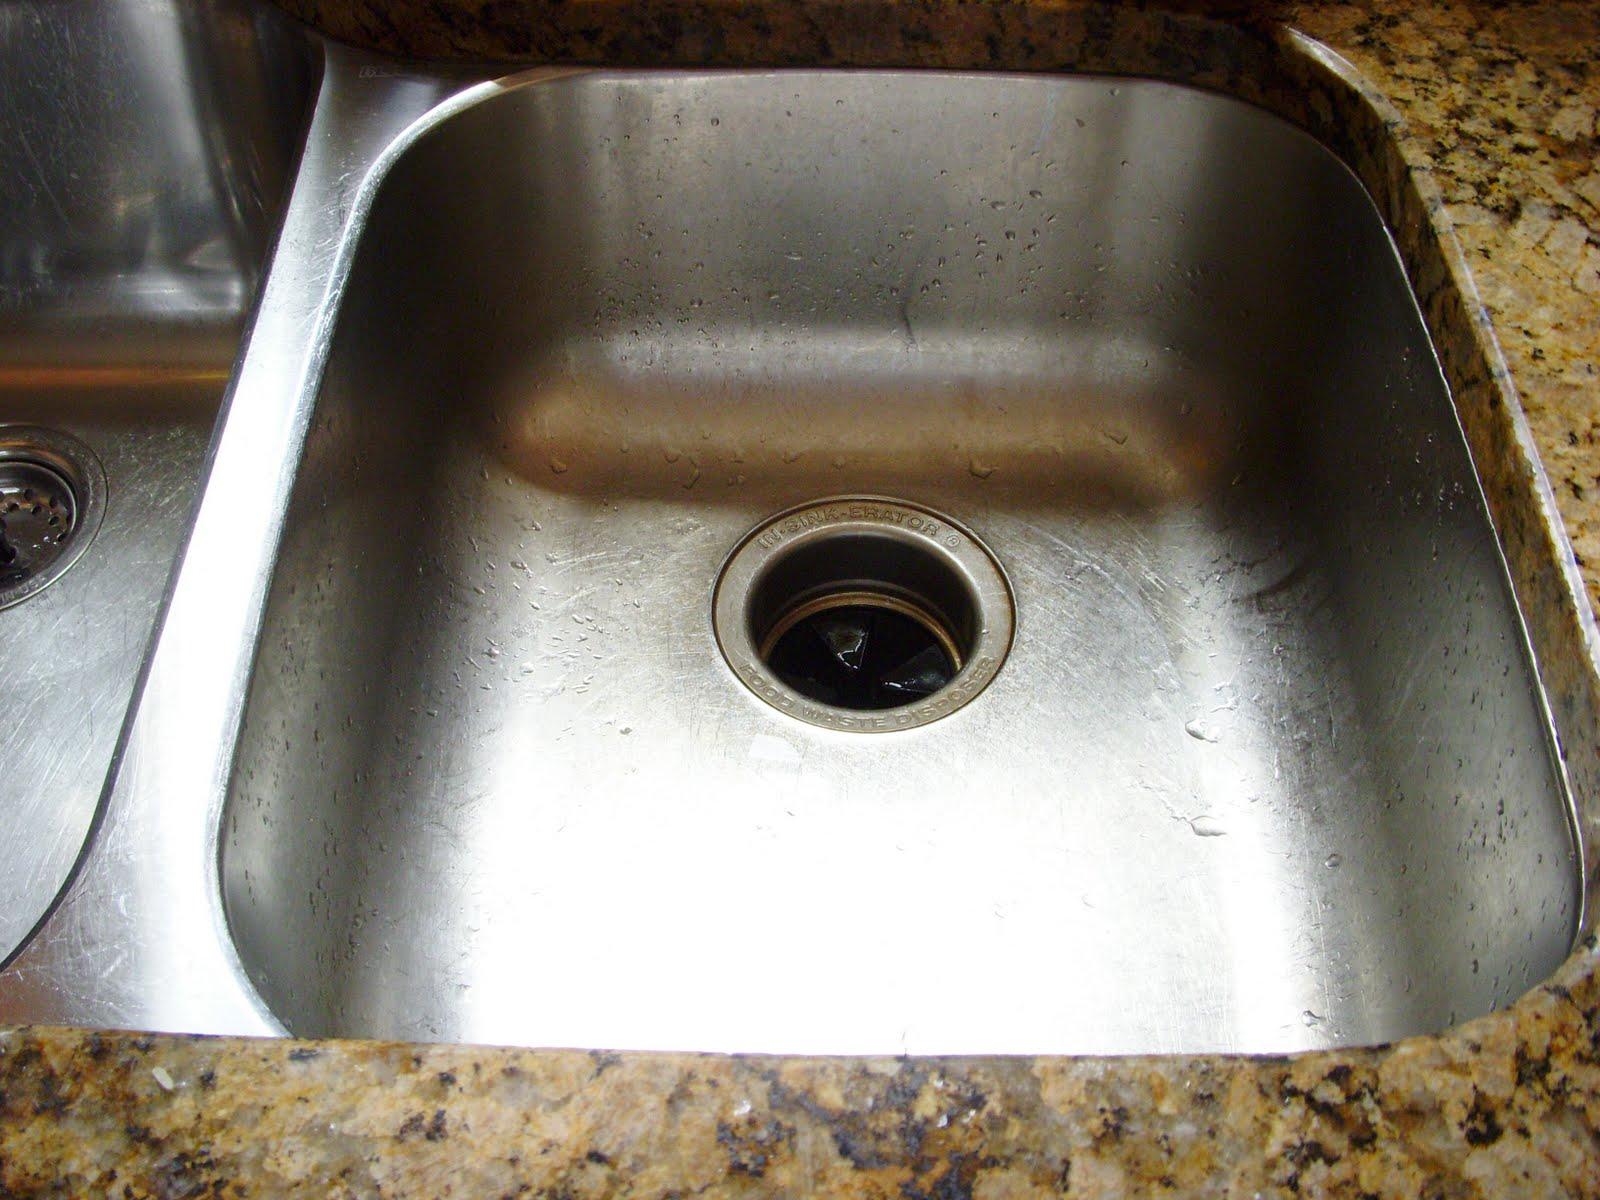 Sink Clean